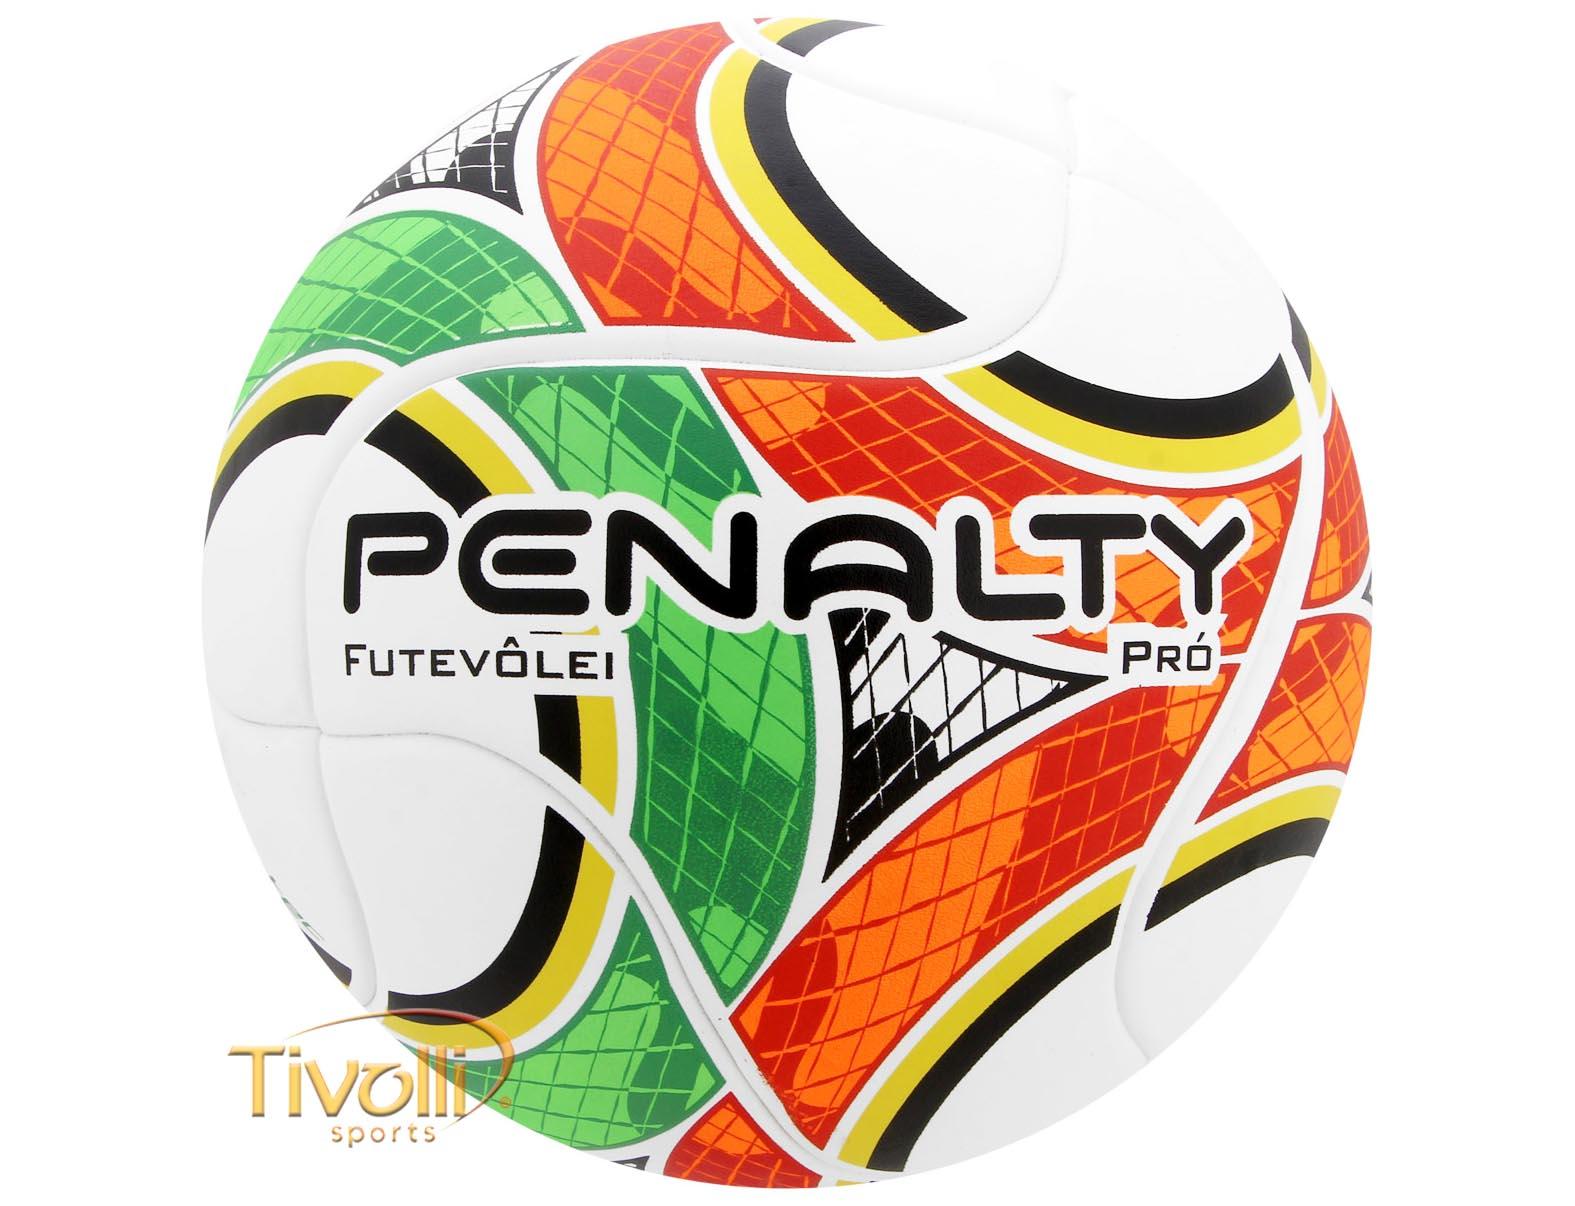 8283d3d609 Bola Futevôlei Penalty Pró VII